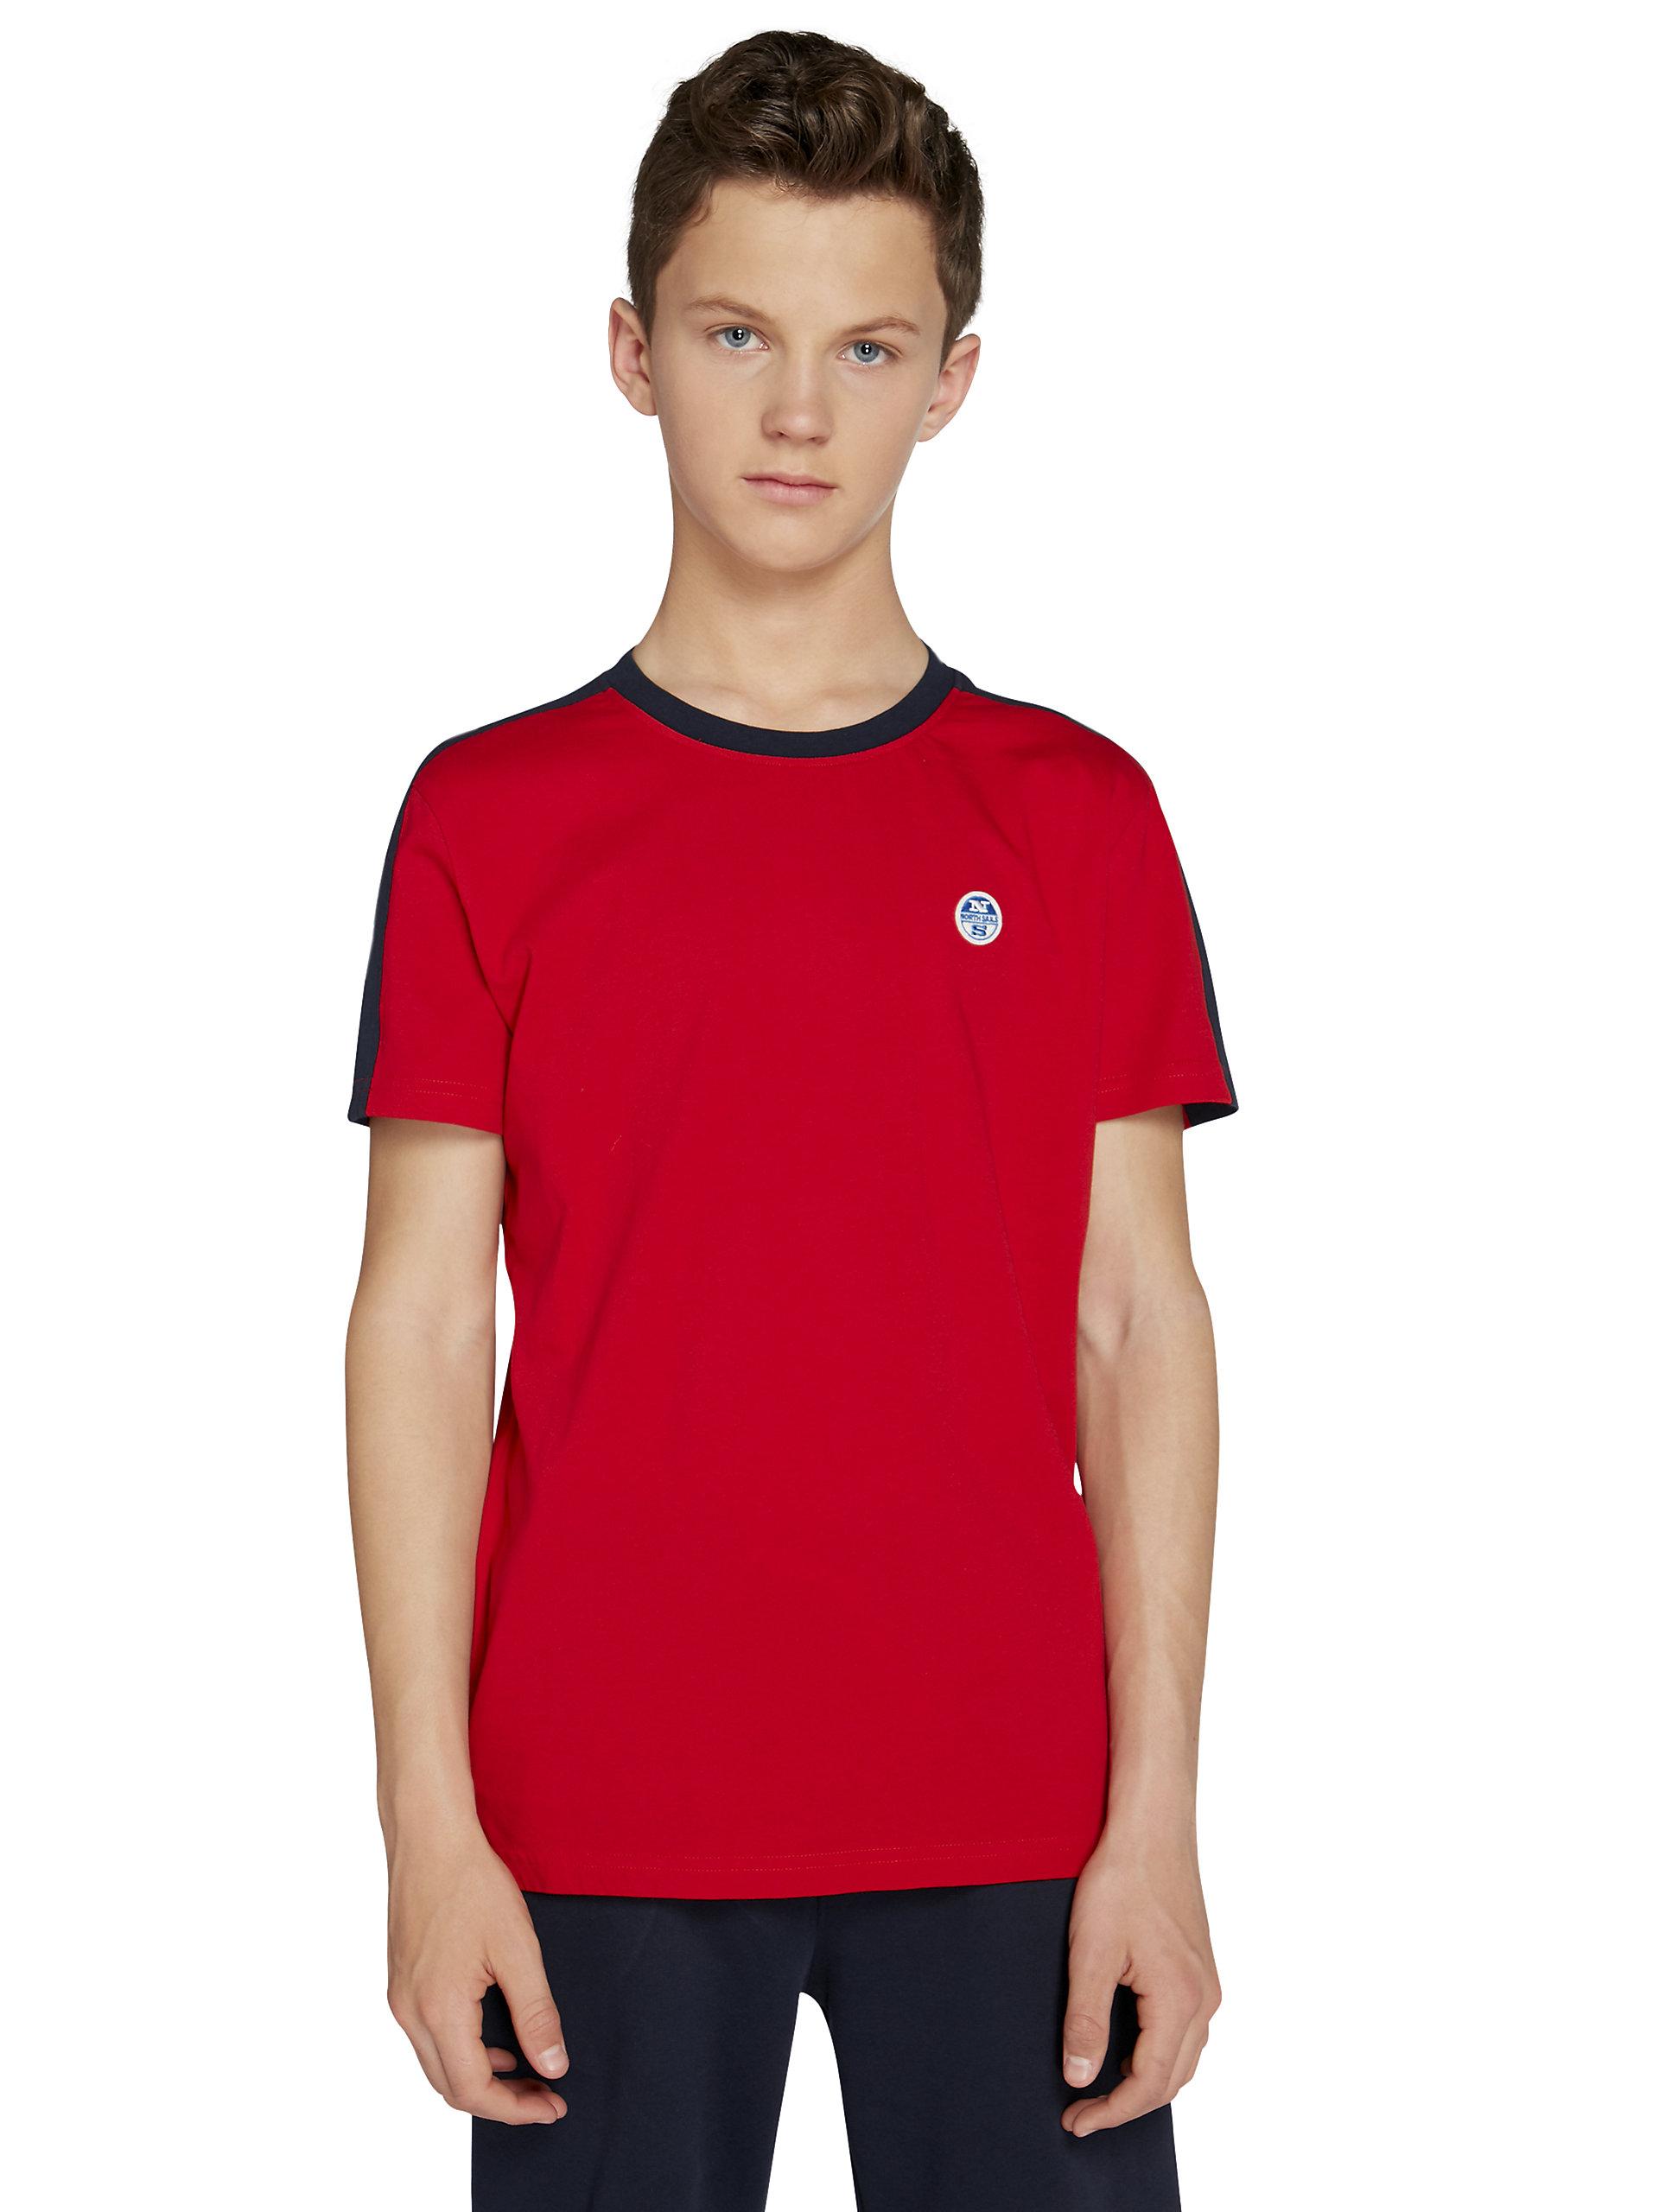 City T-Shirt T794527 | Räumungsverkauf  | | | Billiger als der Preis  | Online  e72c9a